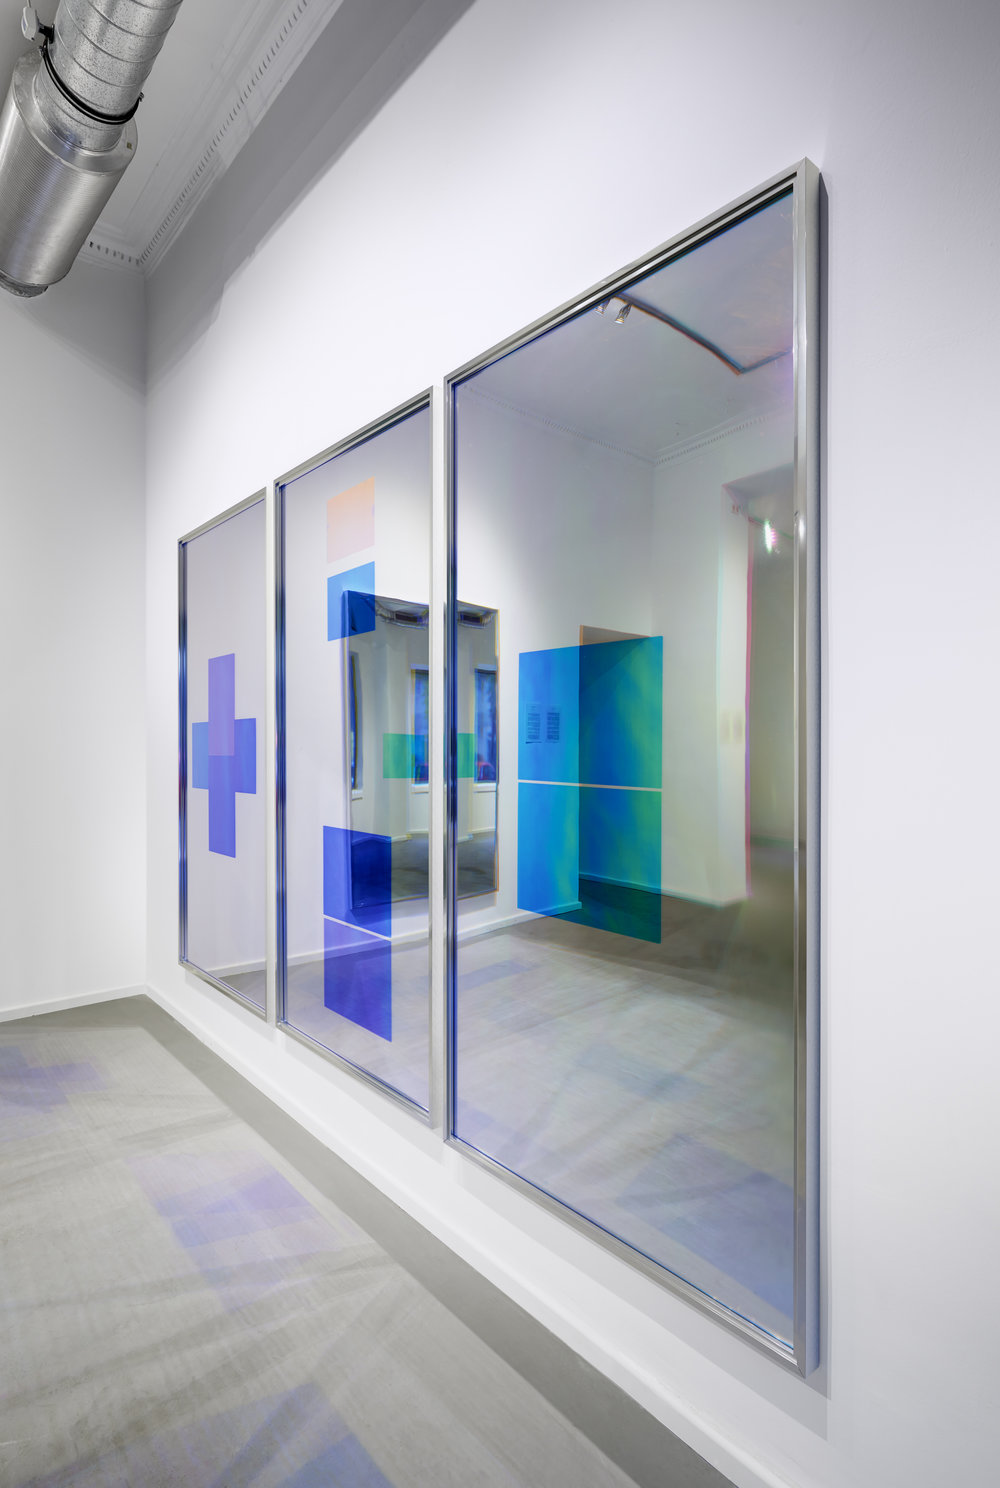 Spiegel im Spiegel / Part I, II, III, IV (Quadriptych),  2014 - Side view Acrylic foil on mirror beneath Radiant Plexiglas, aluminium frame structure 400cm x 200cm (157 x 79 in)